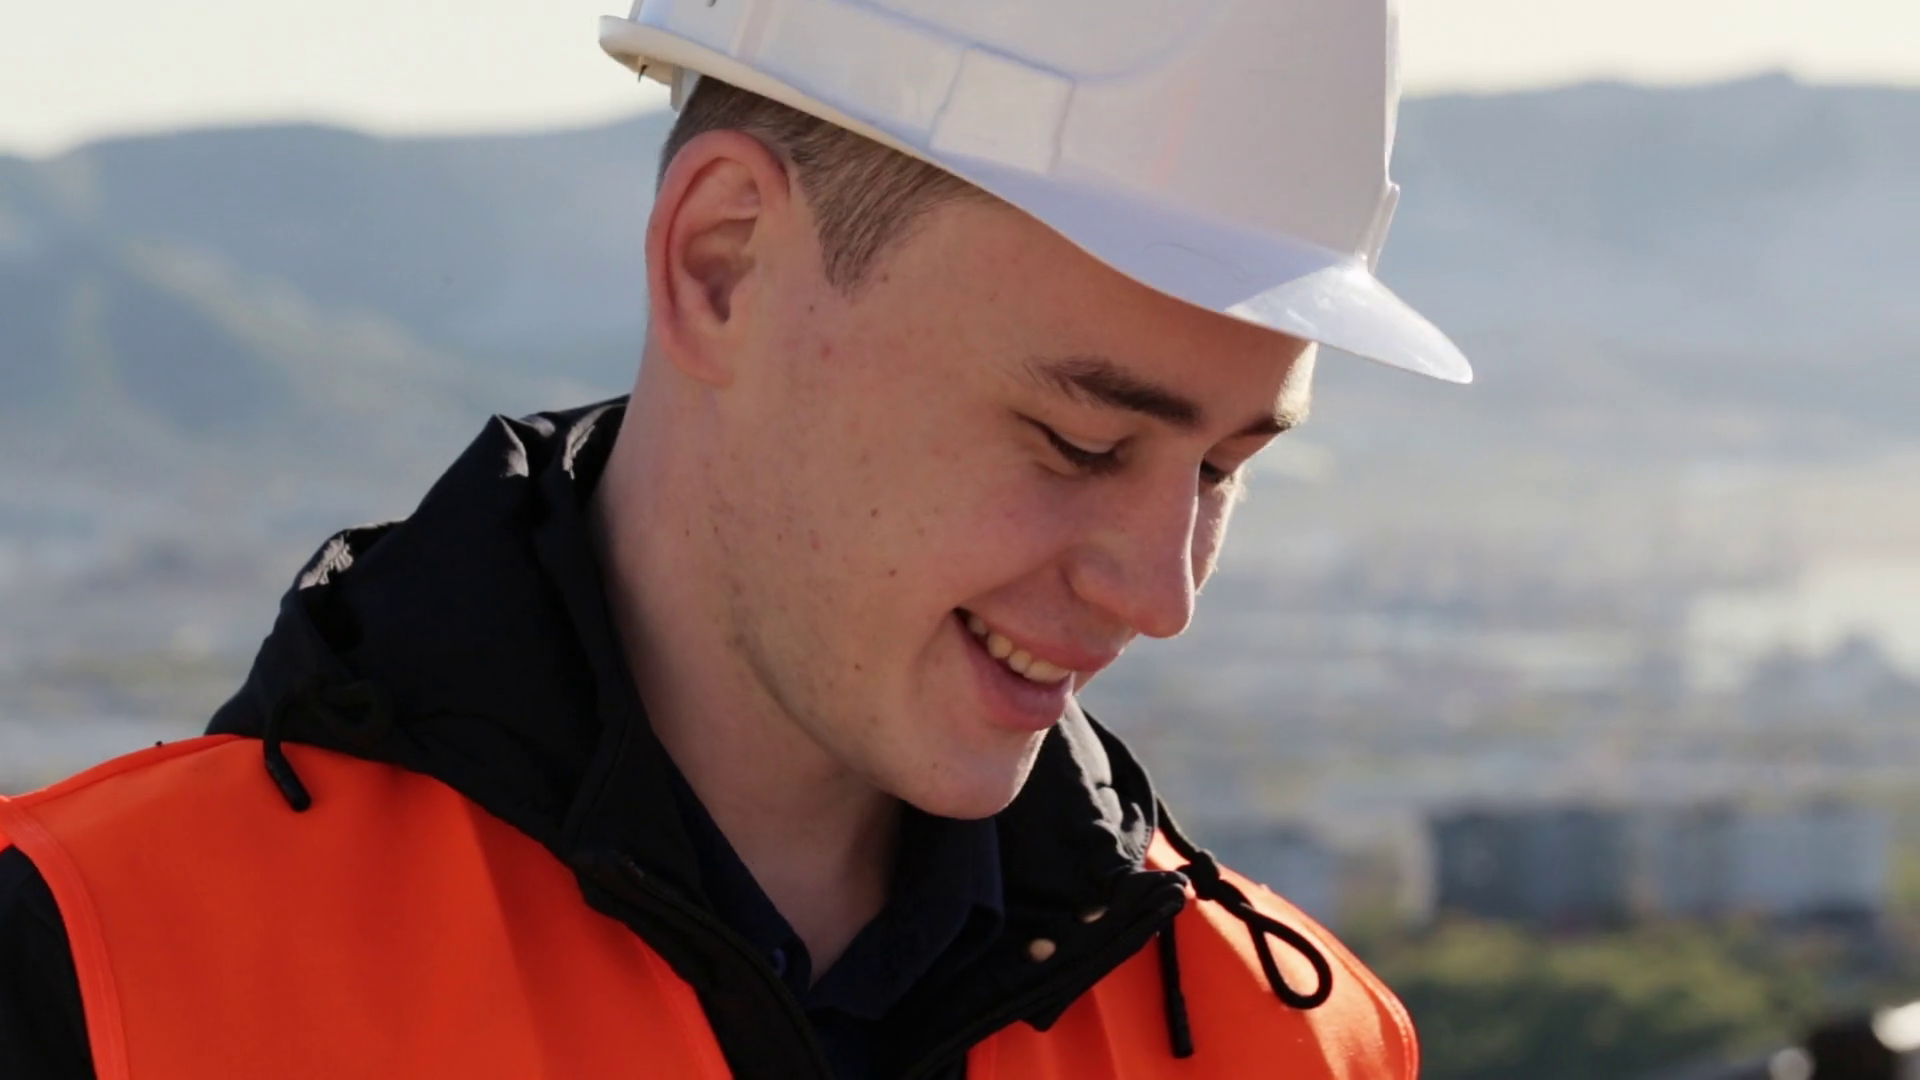 Handsome caucasian man in helmet and vest smiling talking at work ...